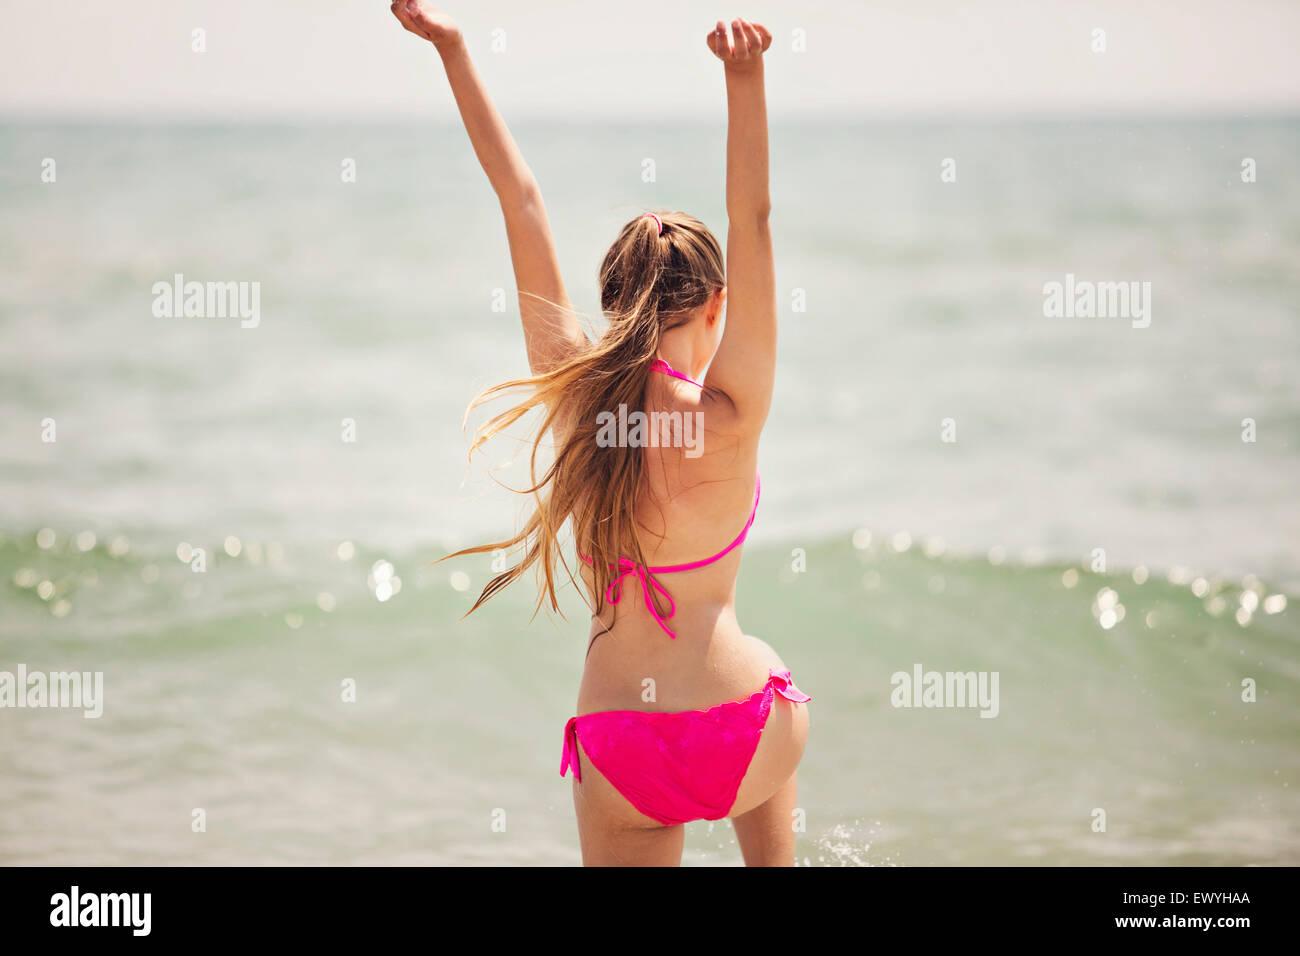 Teenager-Mädchen sprang in die Luft am Strand Stockbild